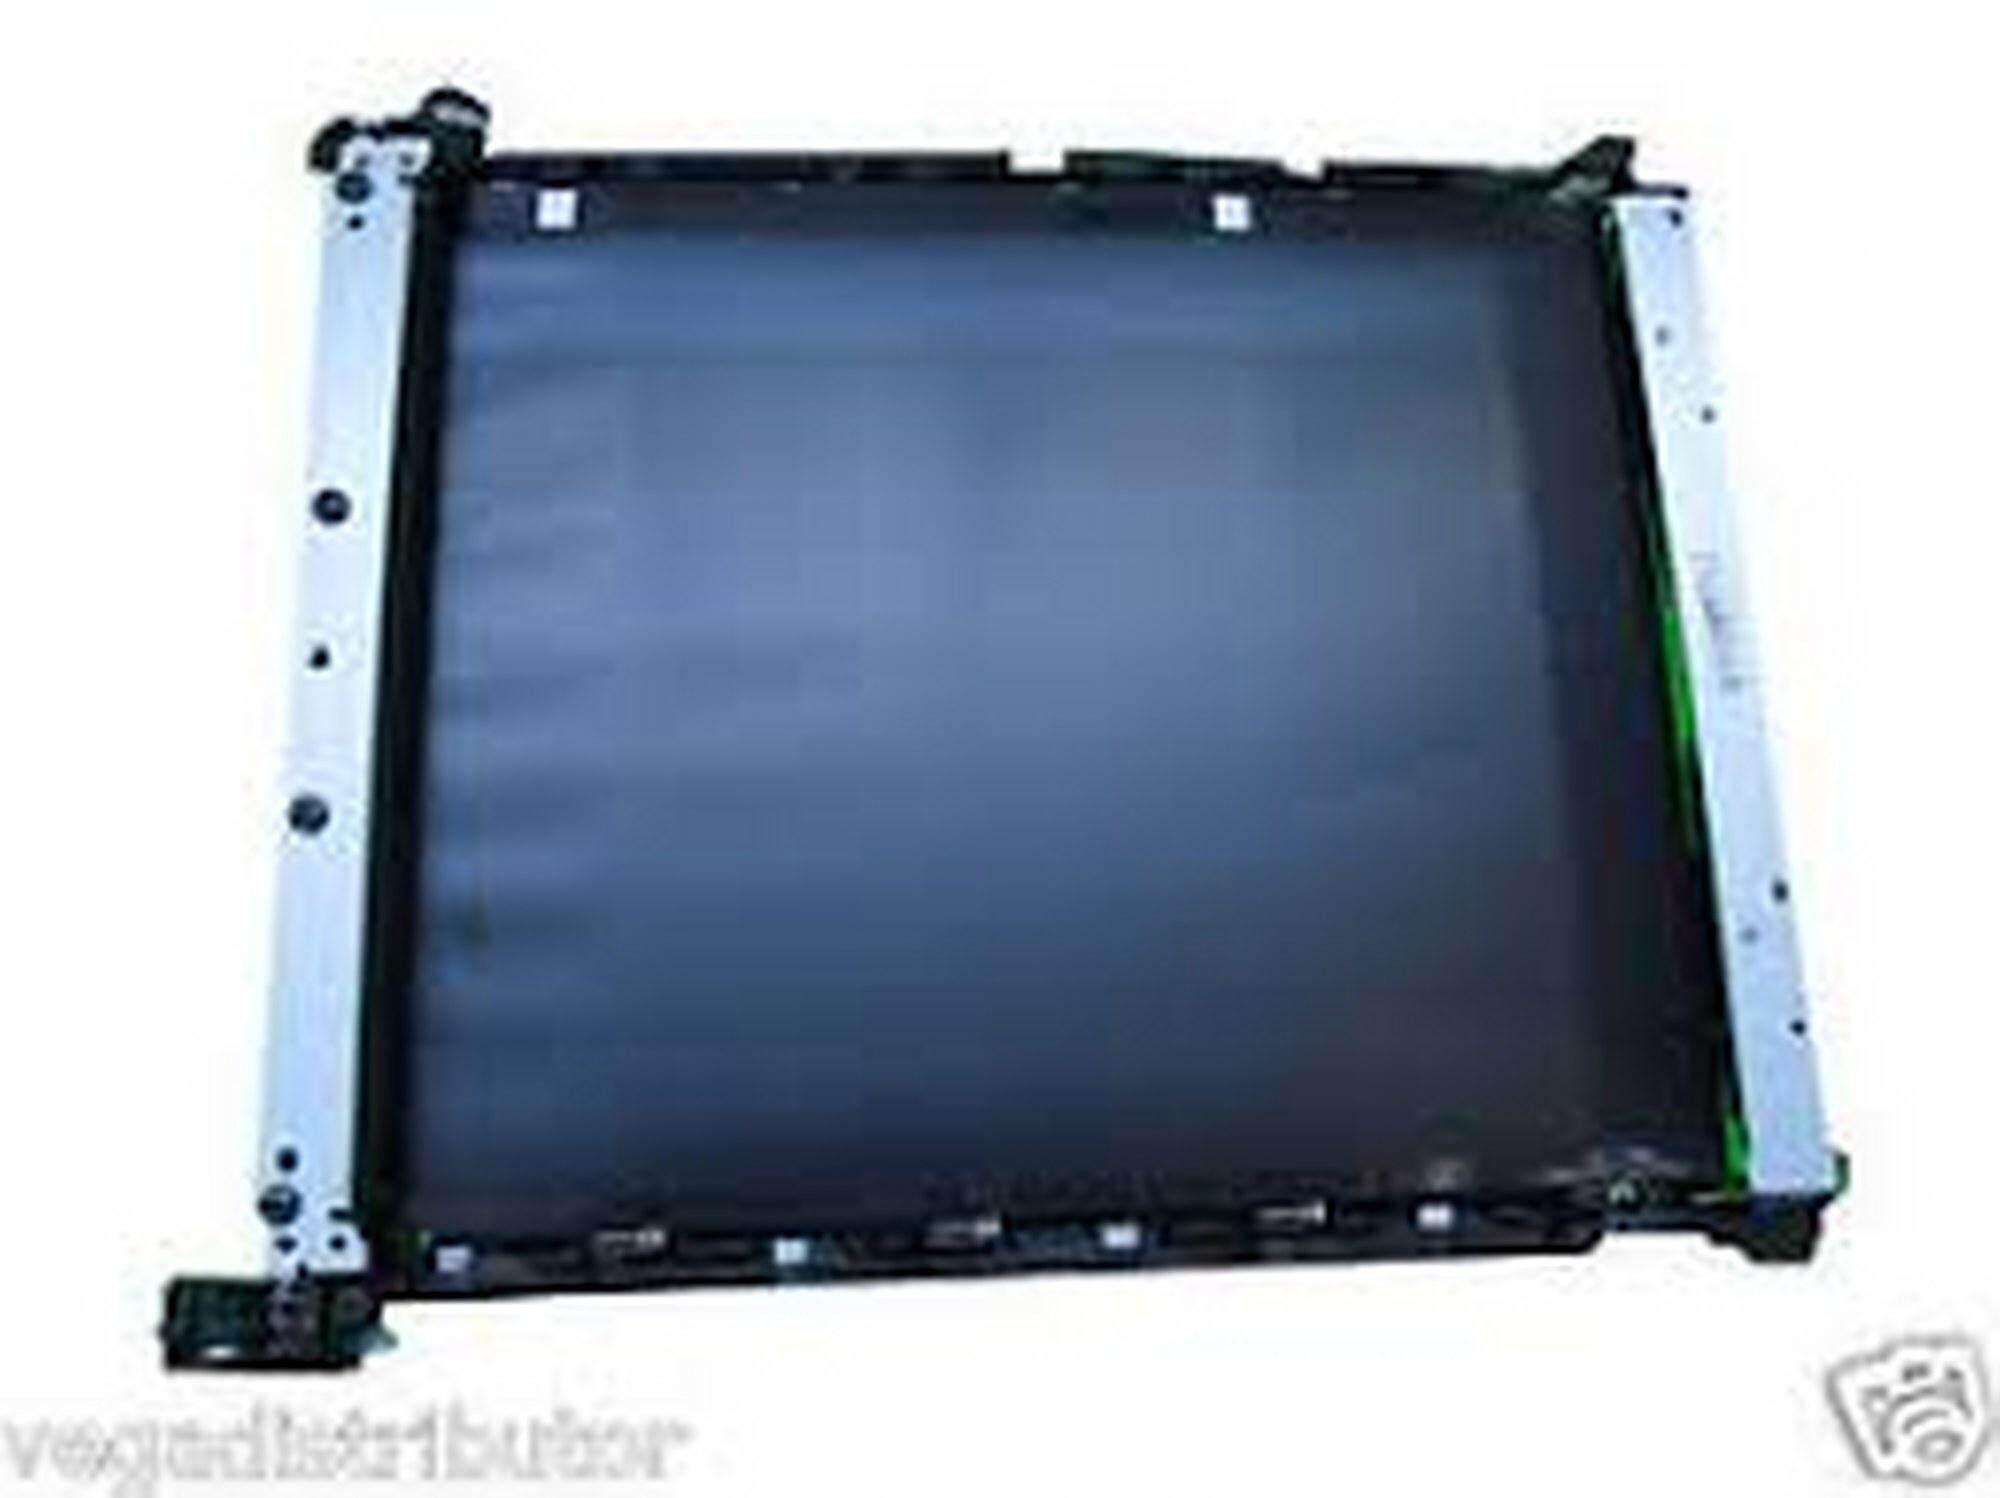 Rs Print Tint Solutions Fuser Film Hp 5000 5100 5200 New Rm35000transfer Belt Assembly Color Laserjet 1215141515151525cm1312canon Imageclass Mf8050cn